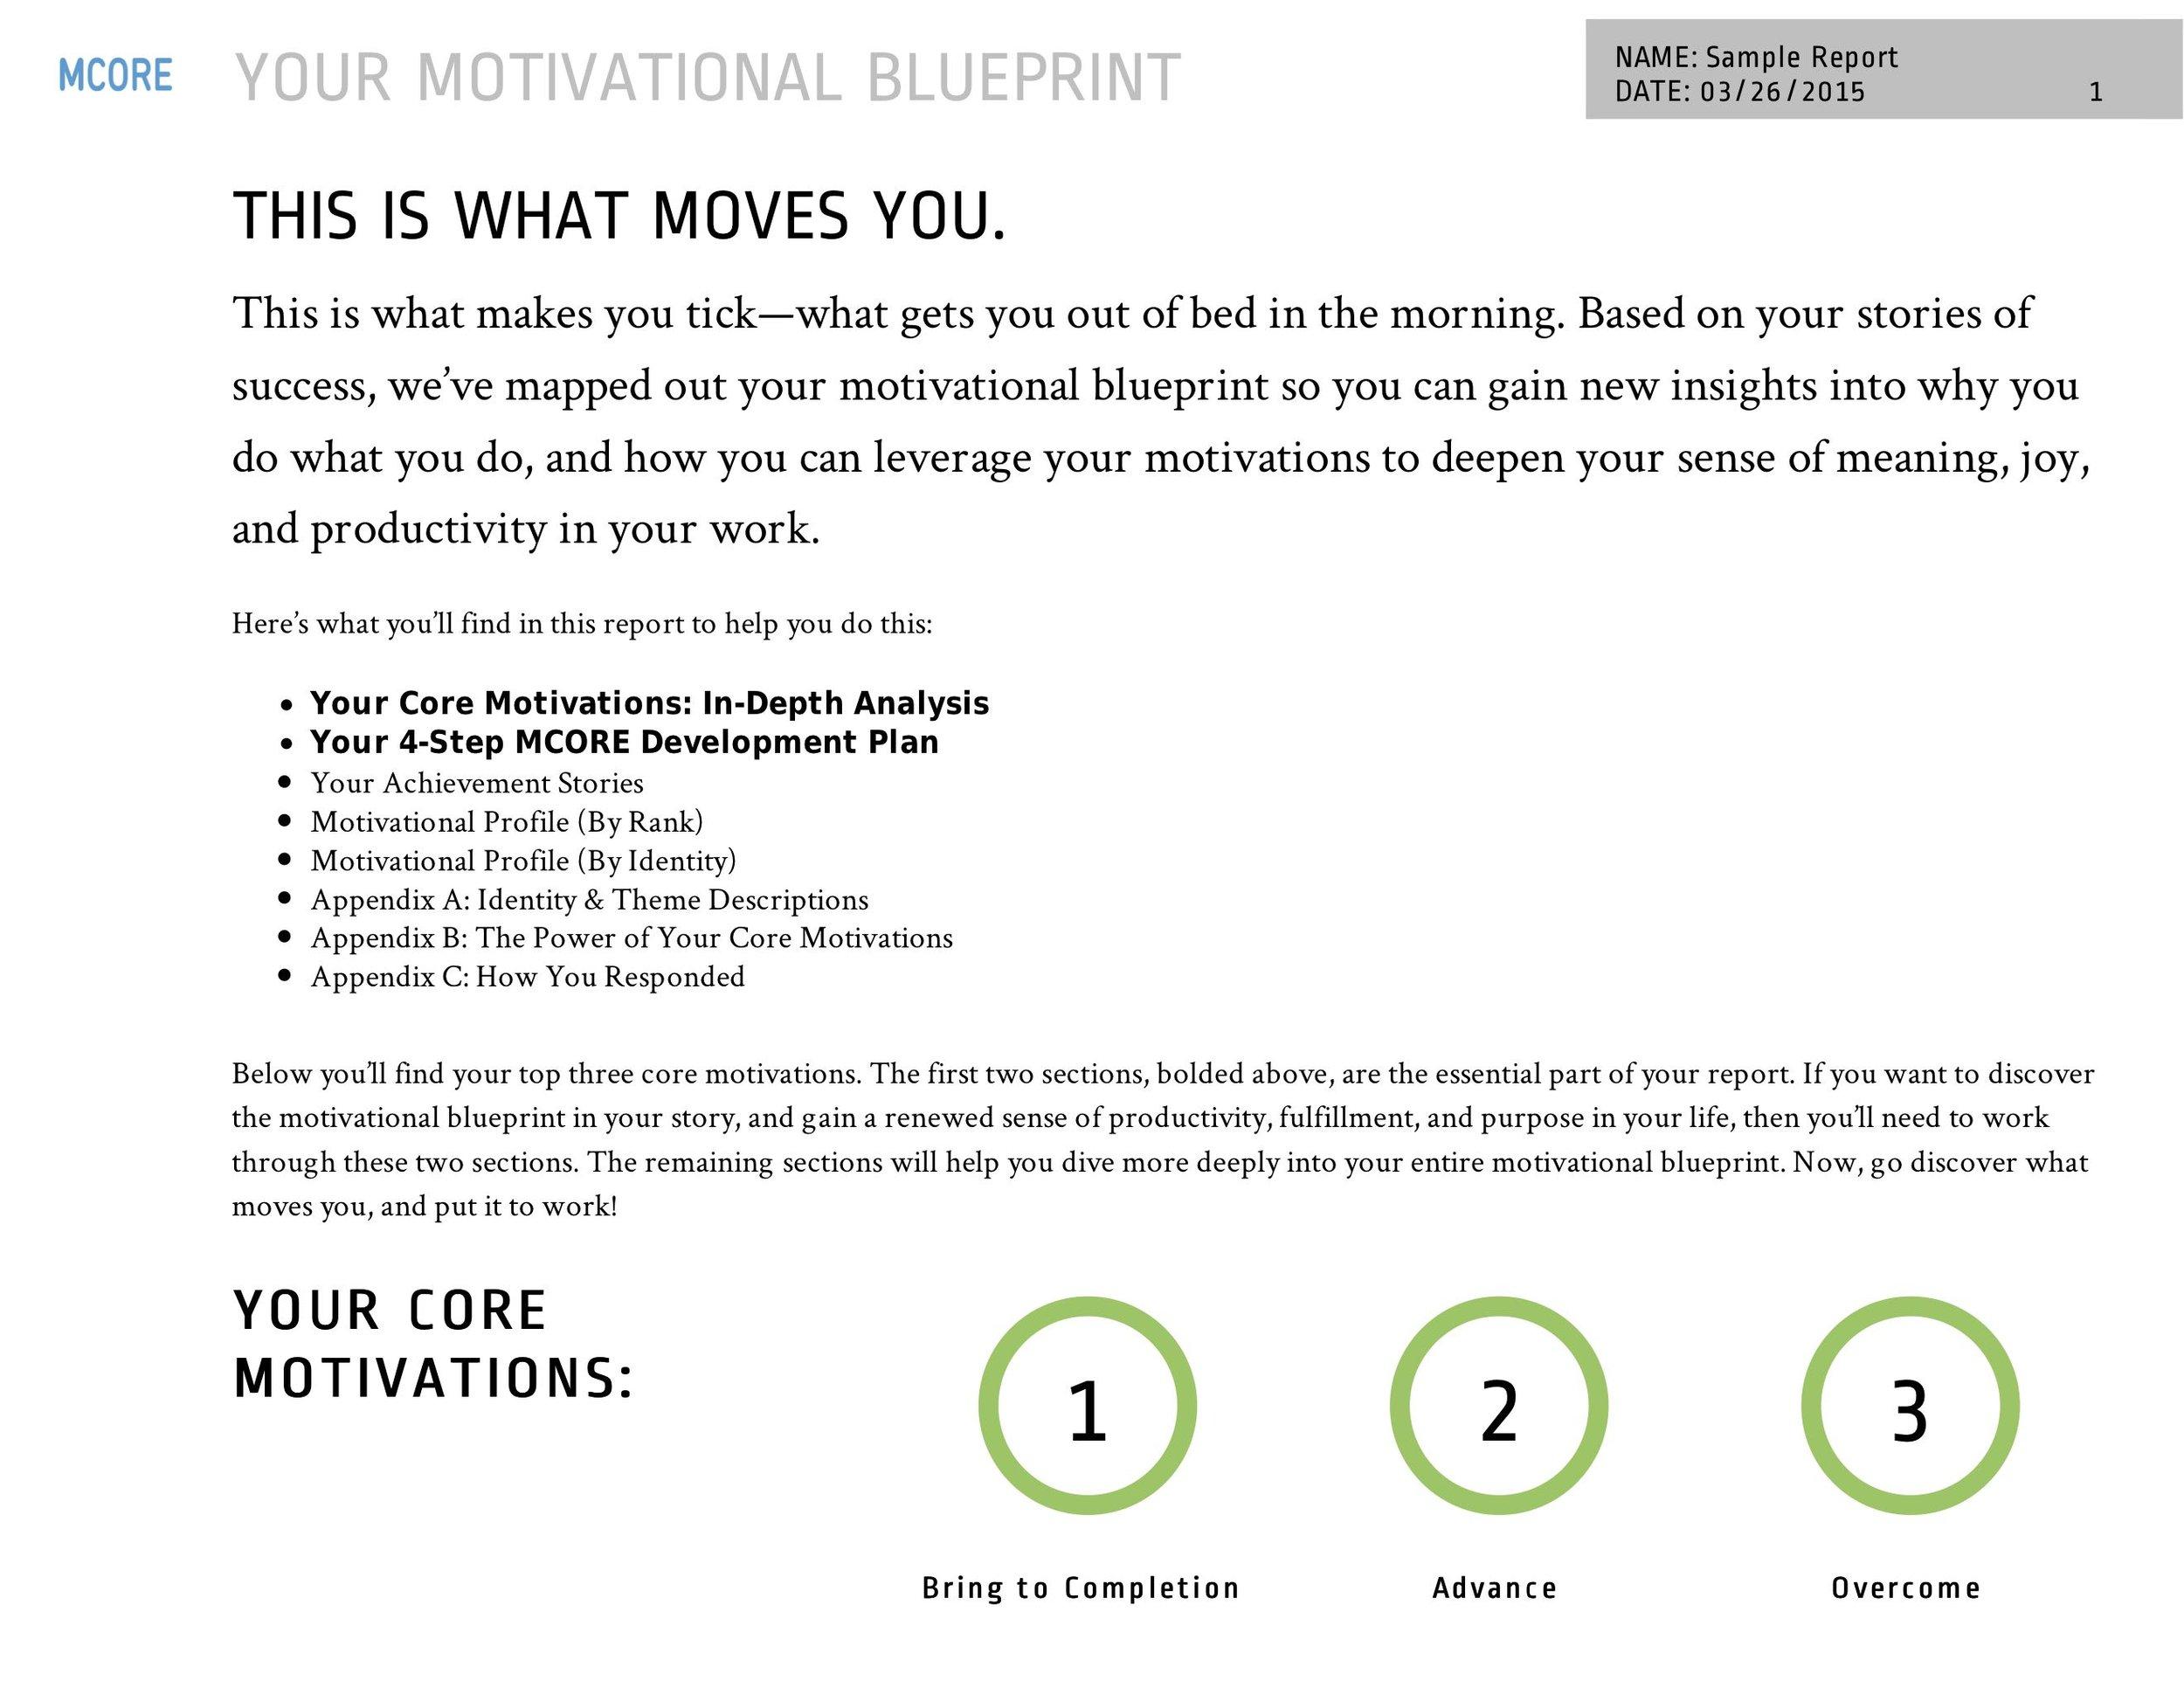 mcore-sample-report-story-solutions-01.jpg